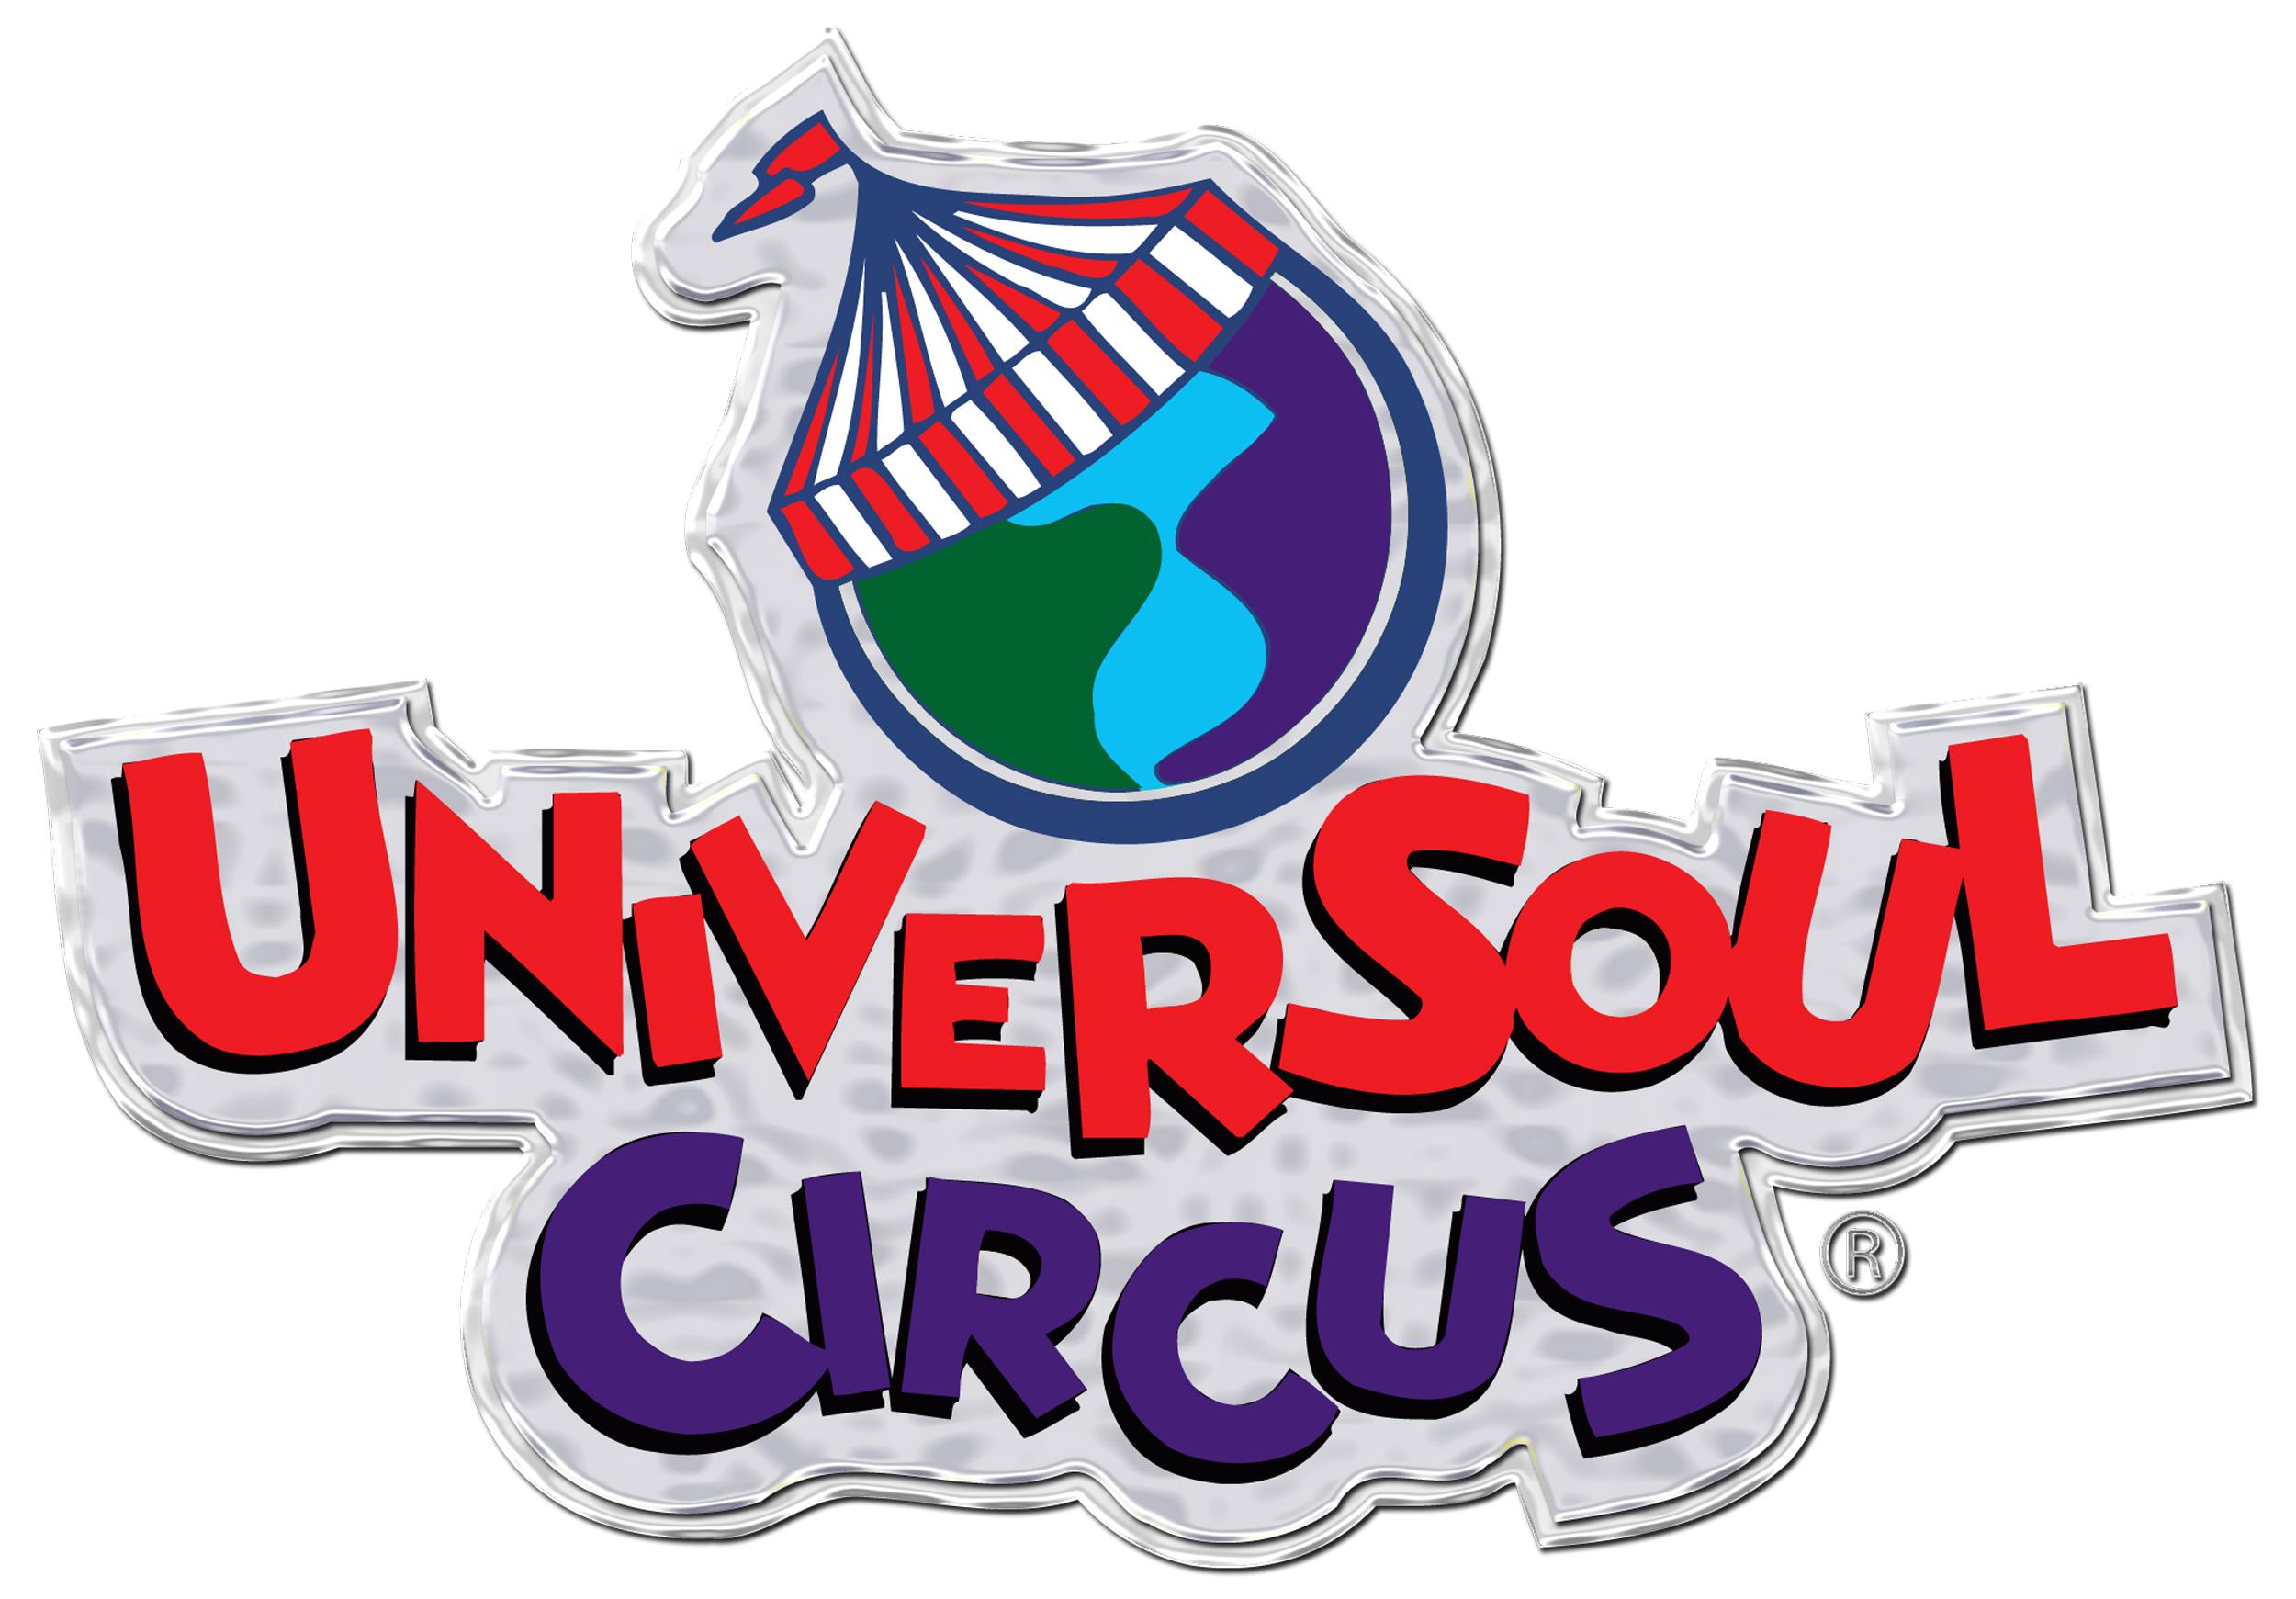 UniverSoul Circus Nov 16th – 21st